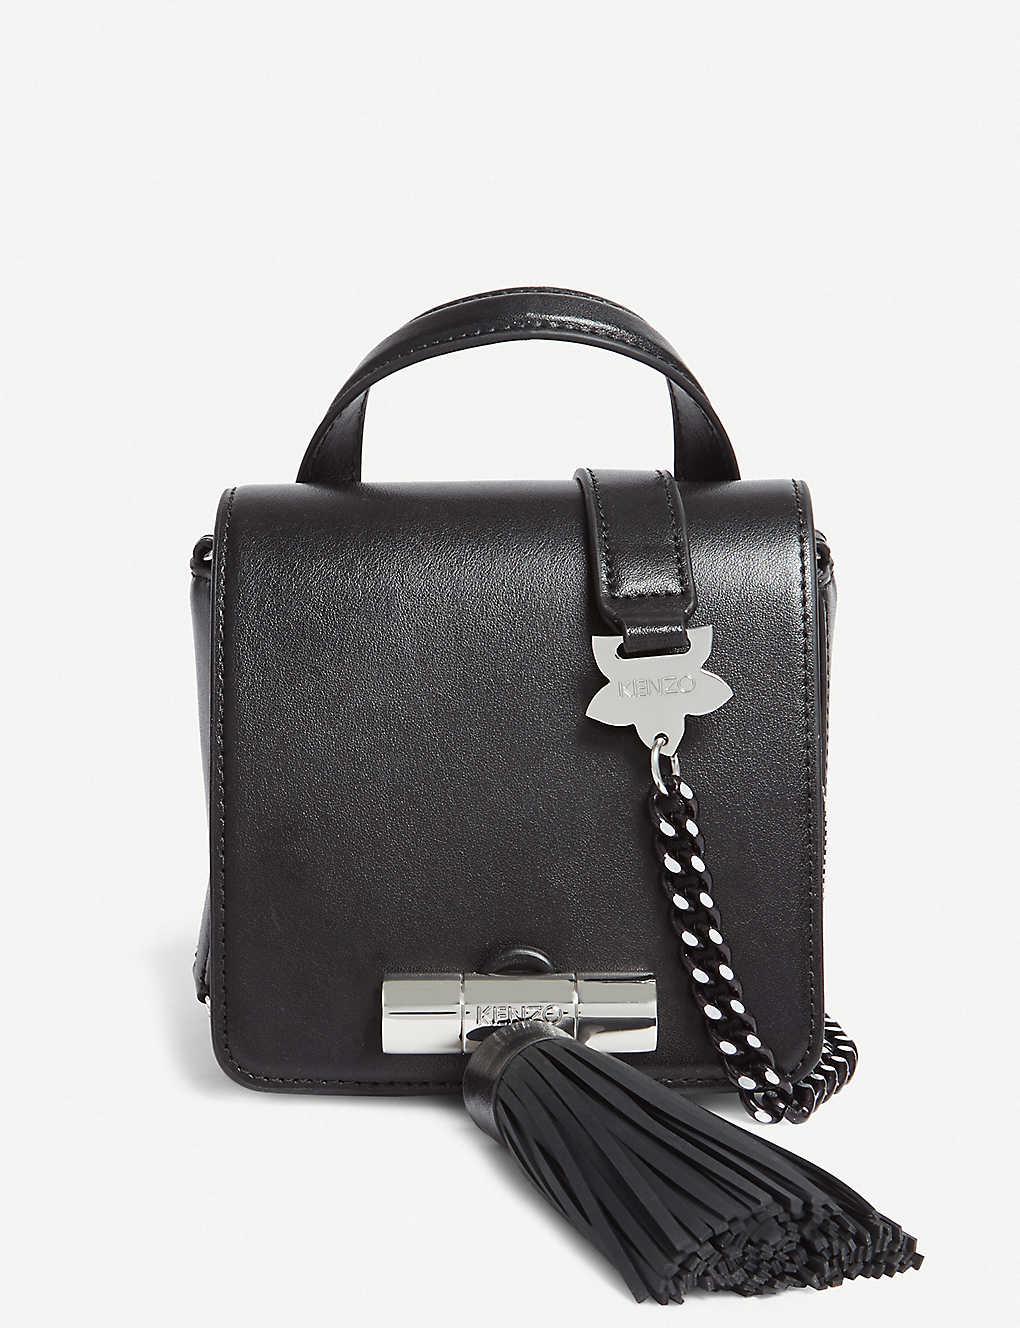 996f53fc05 KENZO - Sailor mini tassel leather shoulder bag   Selfridges.com